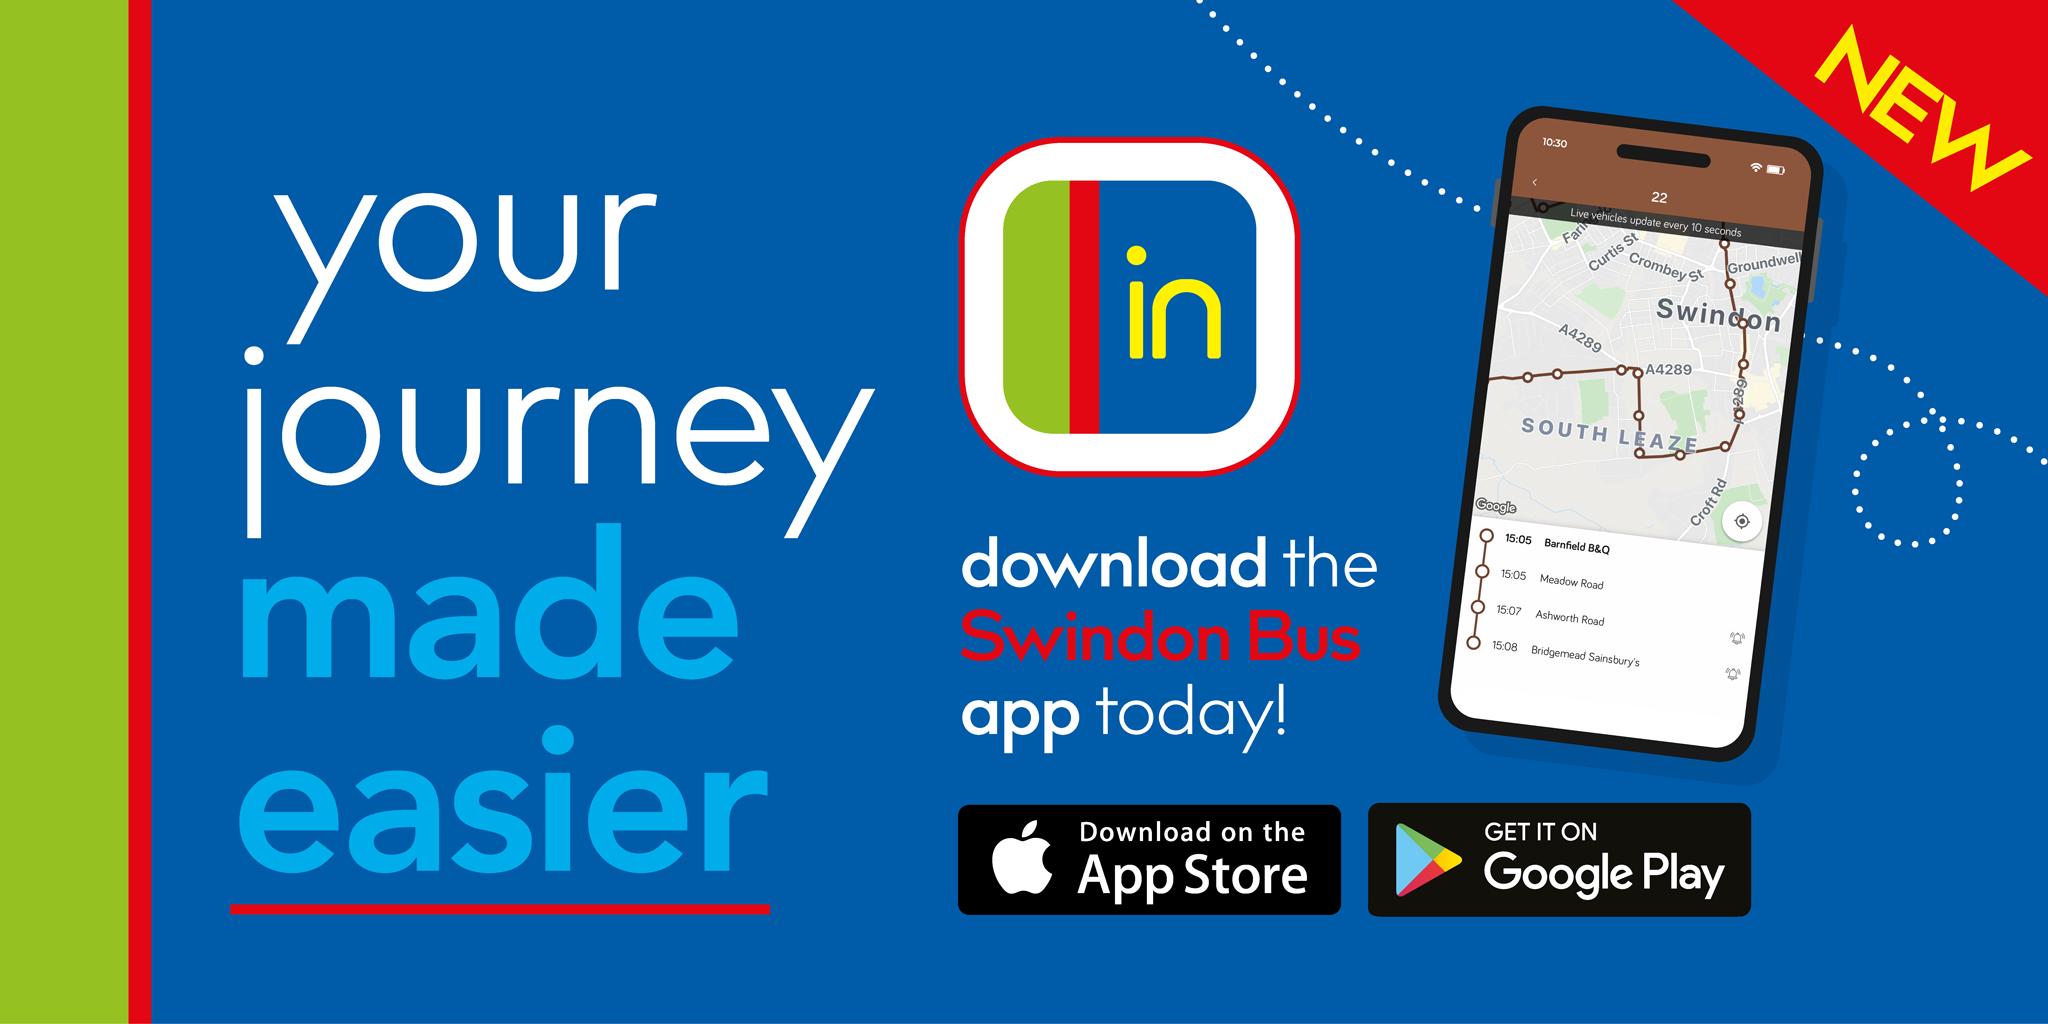 Swindon Bus app